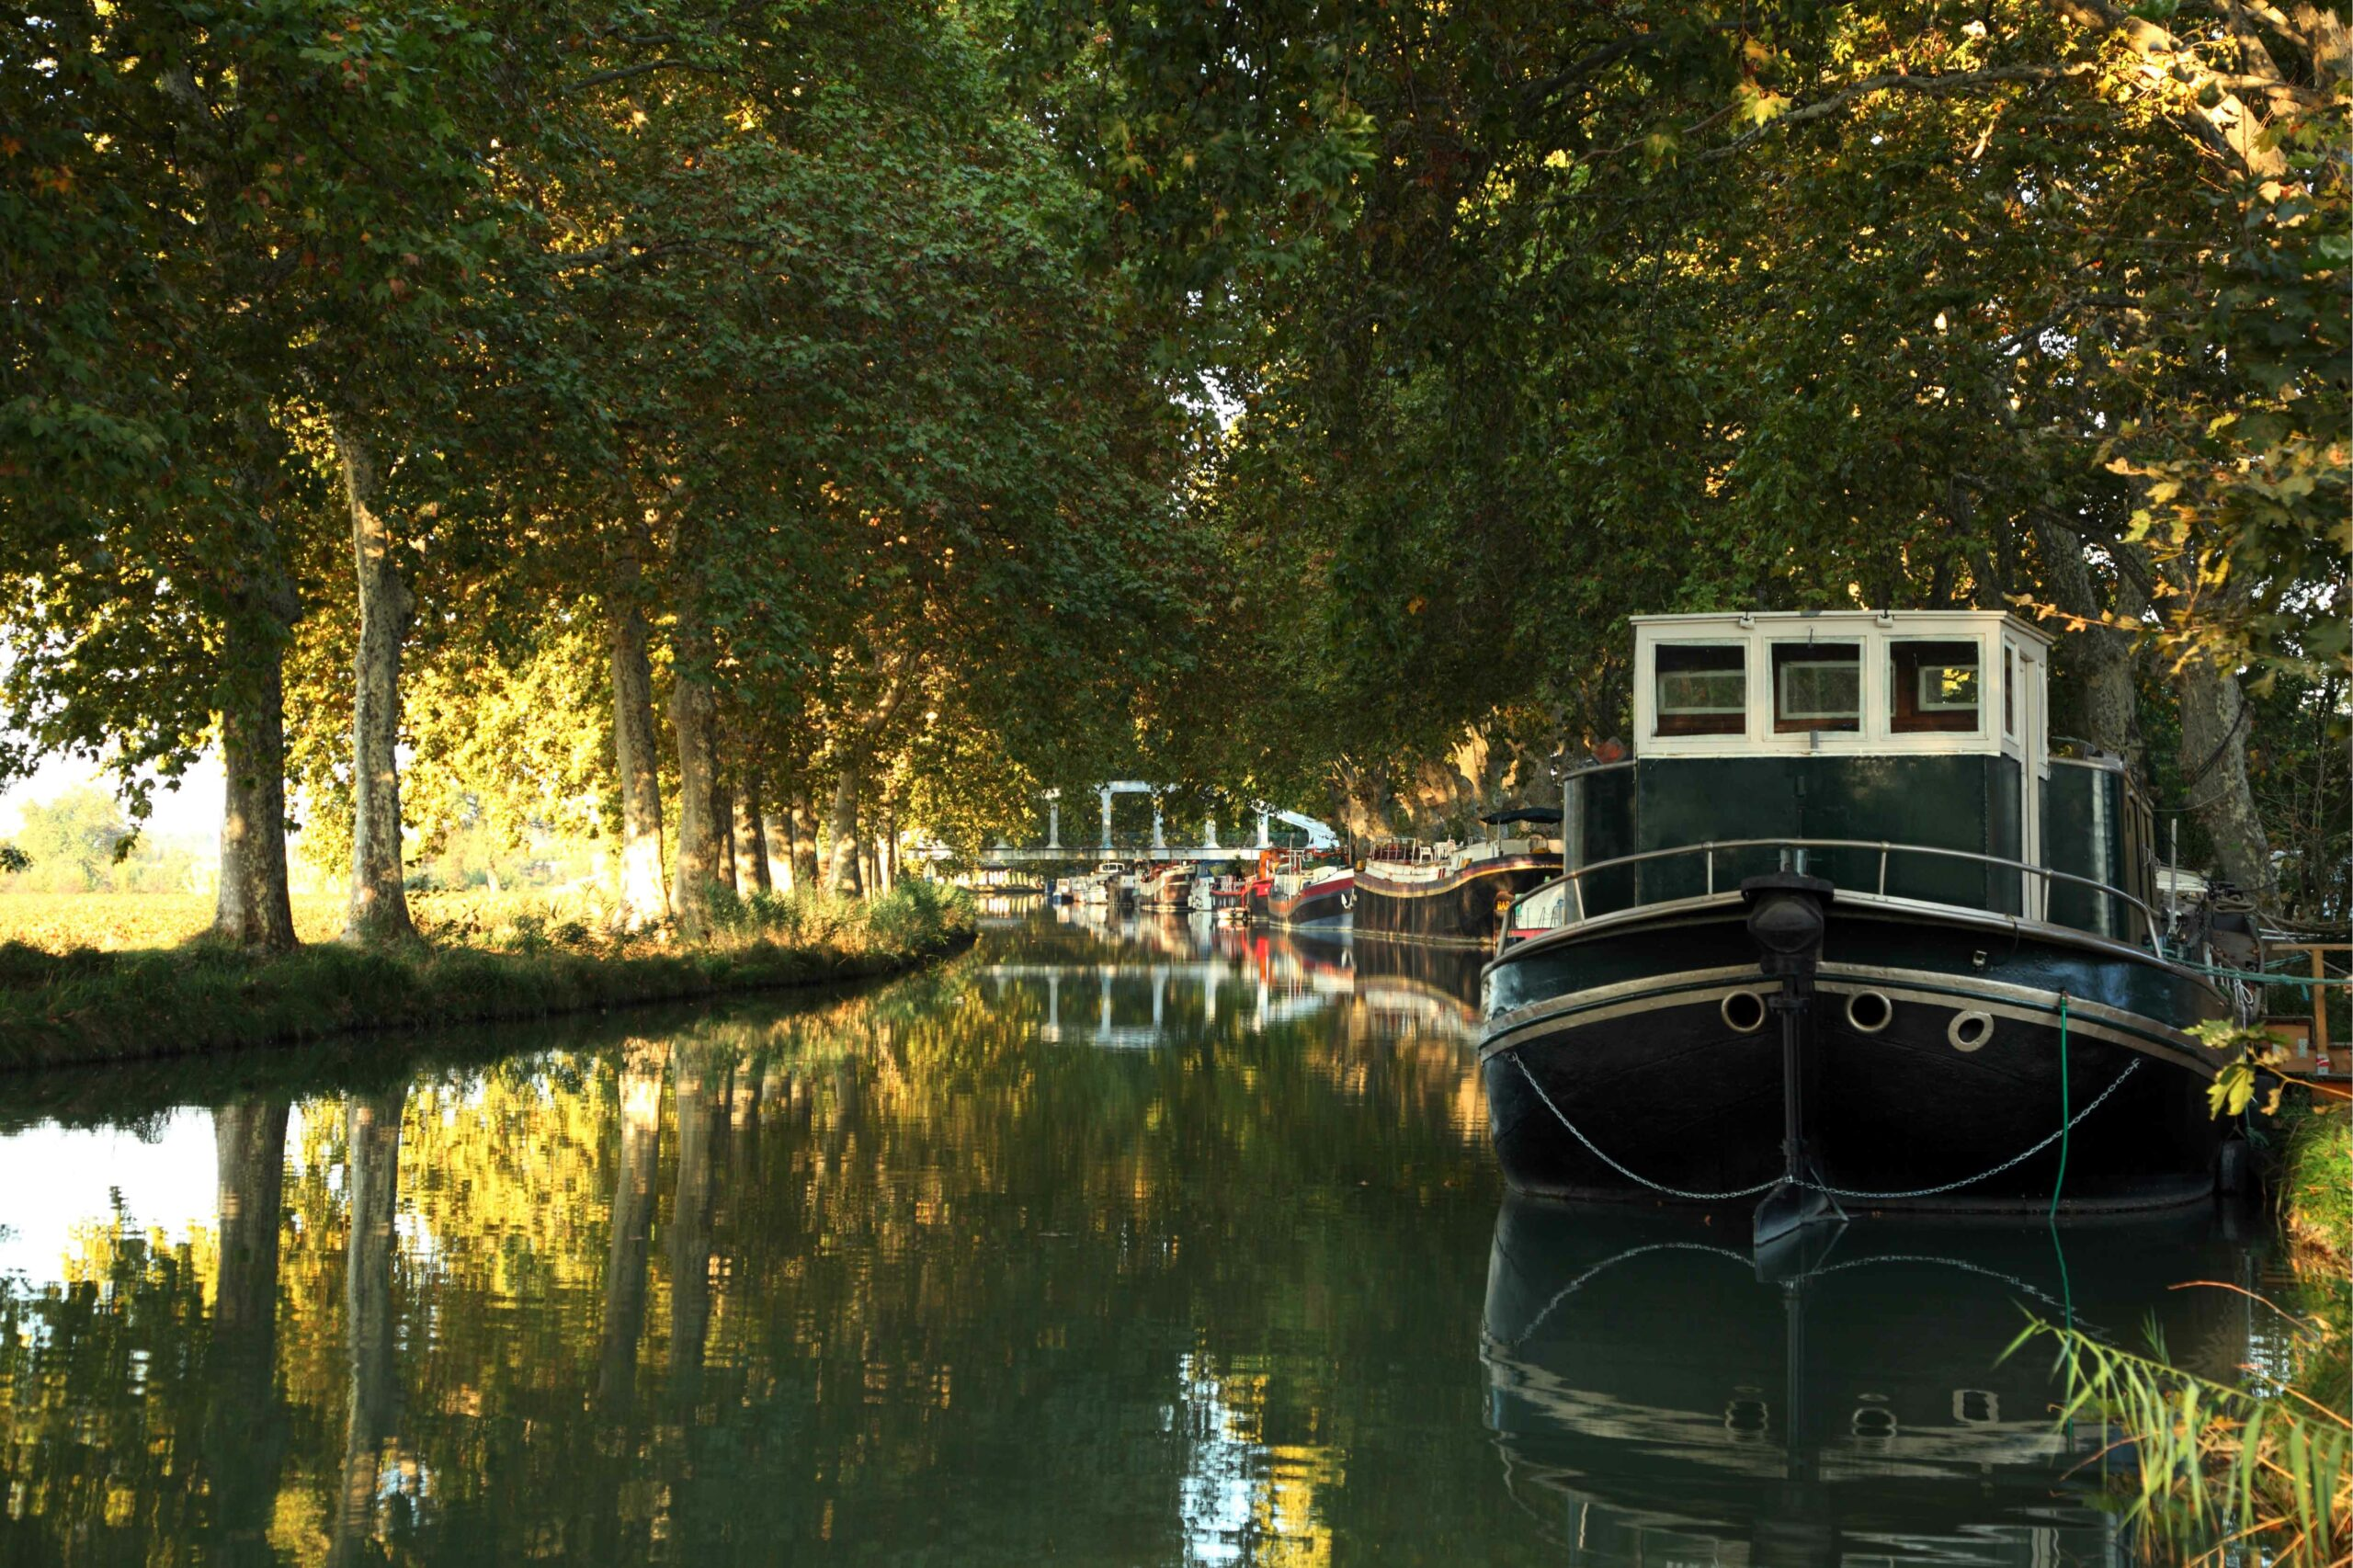 Canal_du_Midi_1-(1)